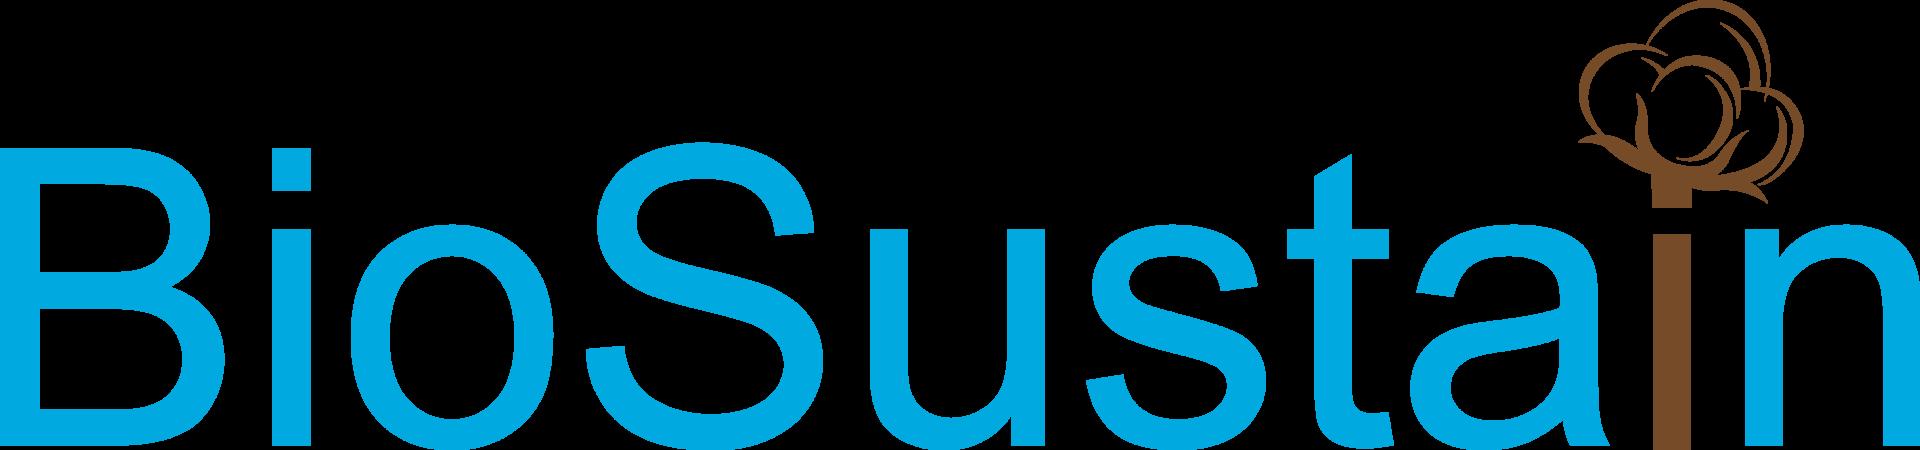 https://cottonmadeinafrica.org/wp-content/uploads/biosustain-logo-large.png